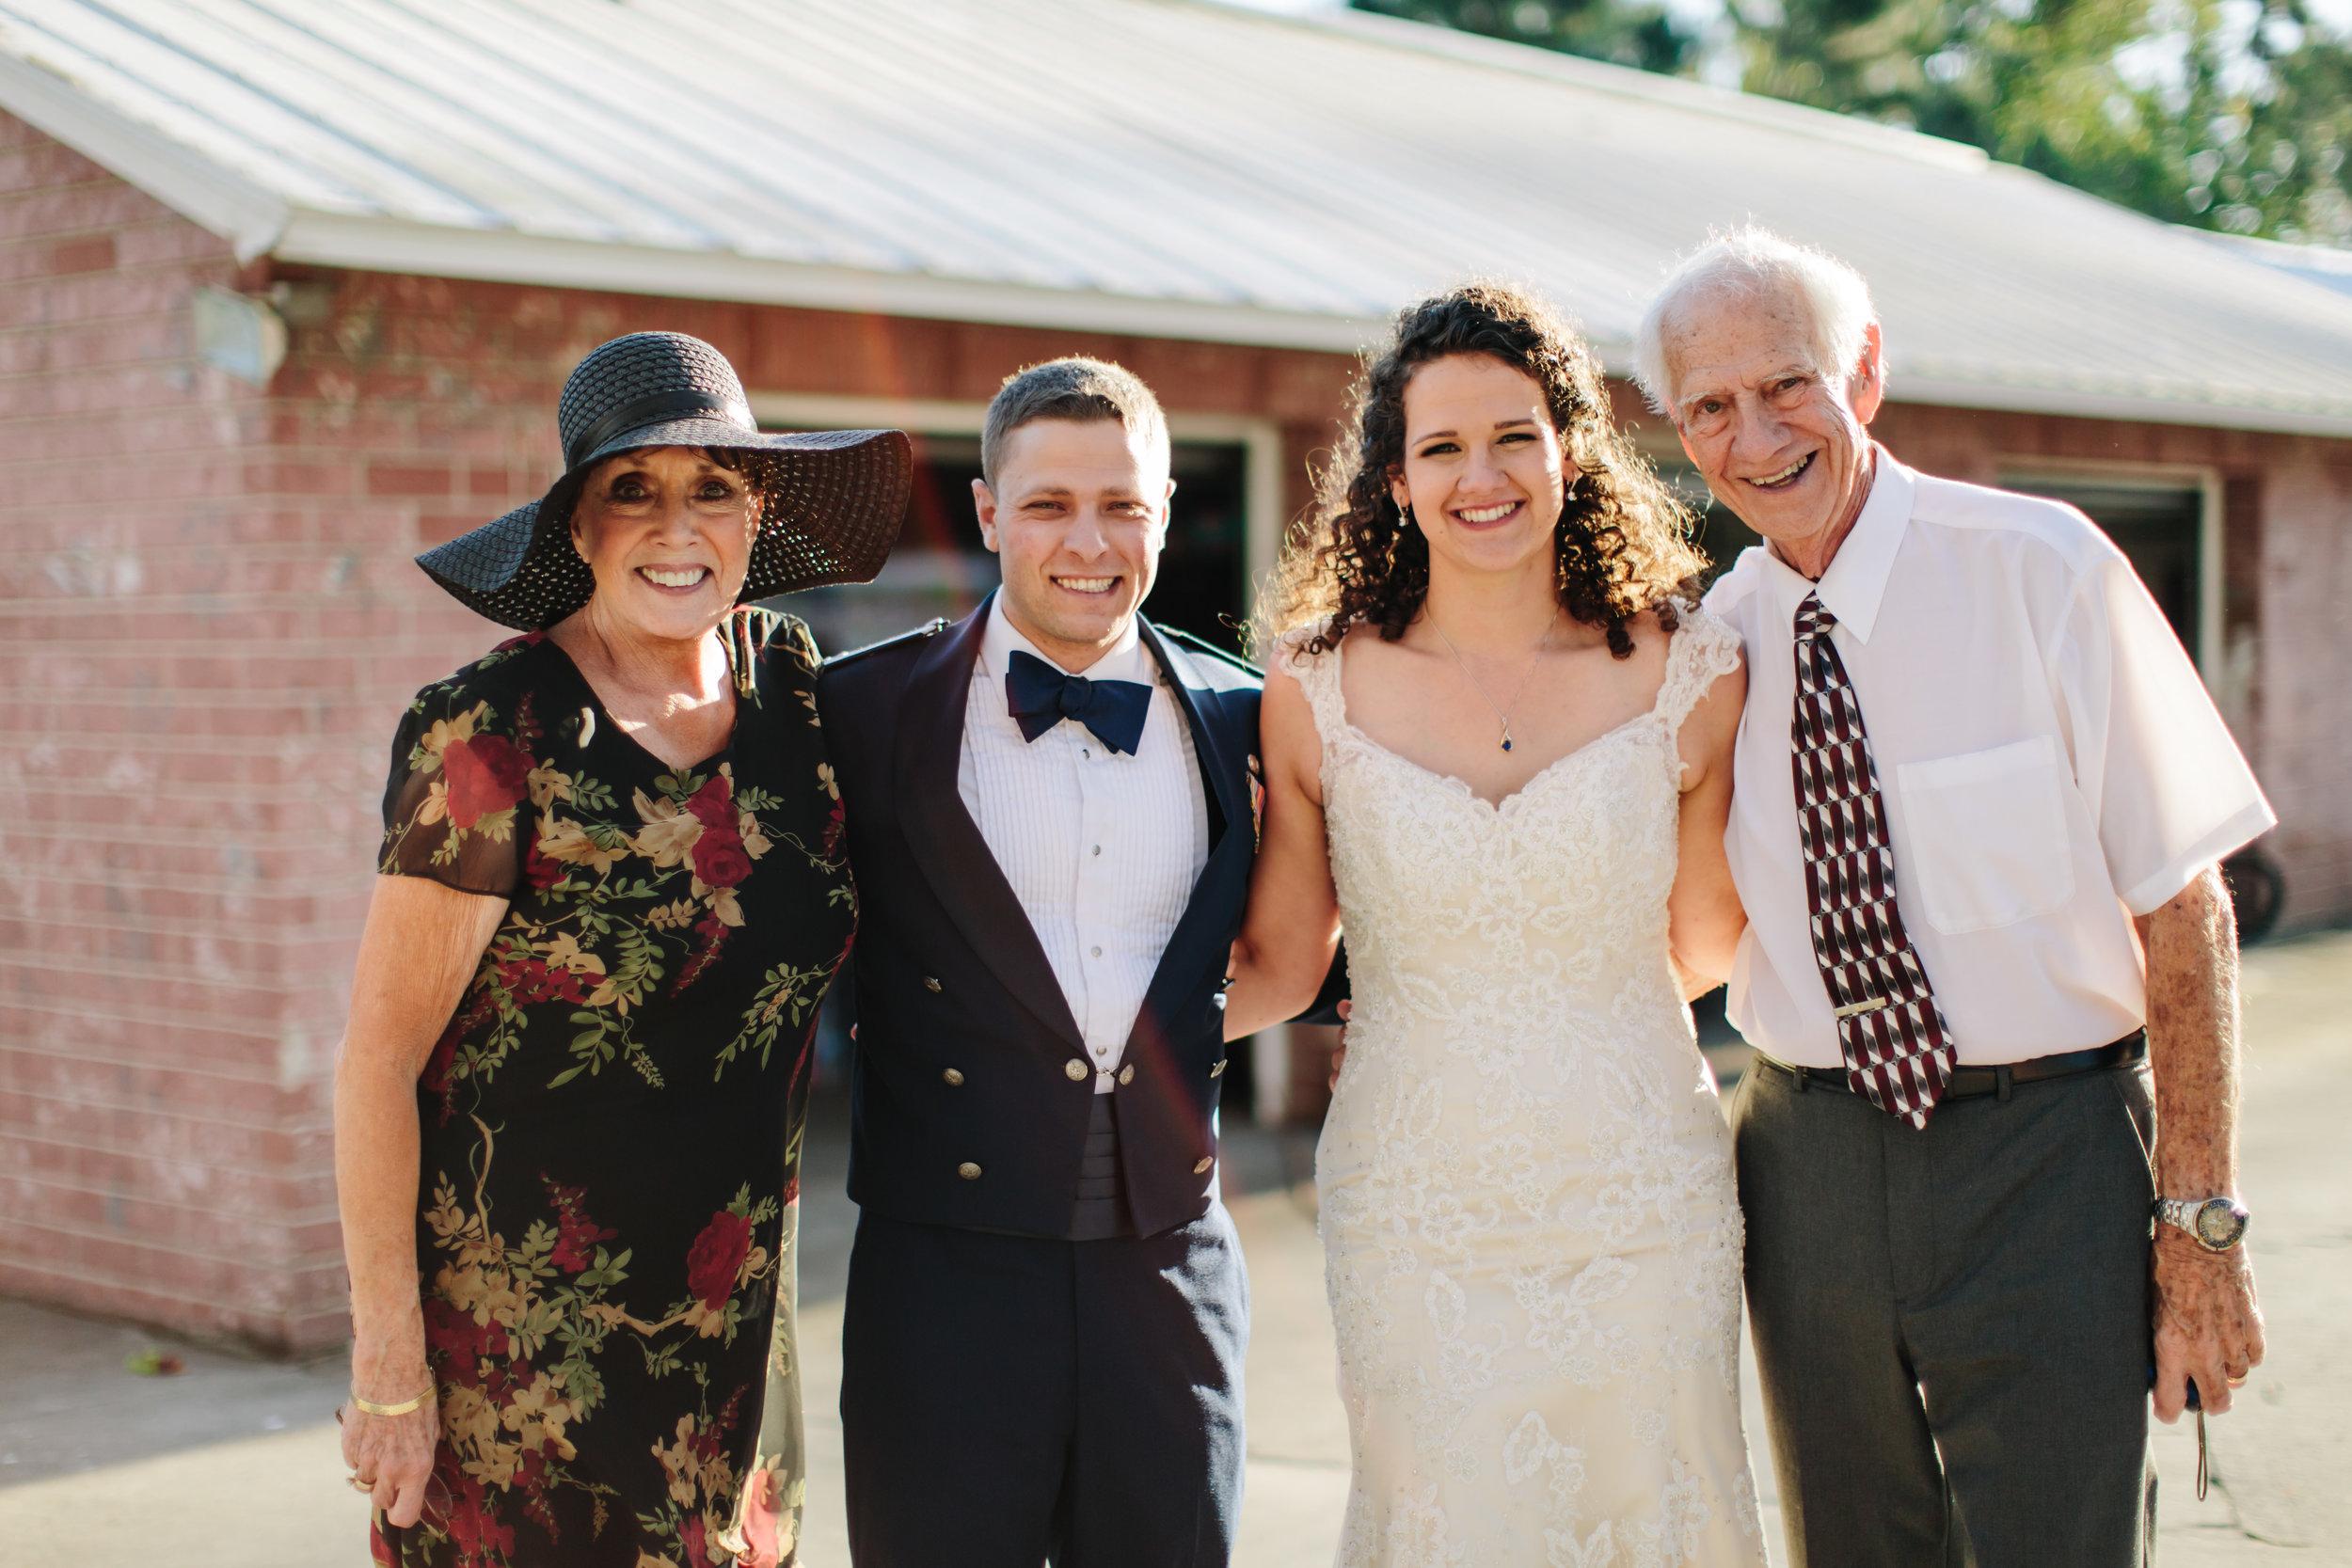 2018.03.17 Allison and Chuck Wedding Waelti Melbourne (697 of 569).jpg